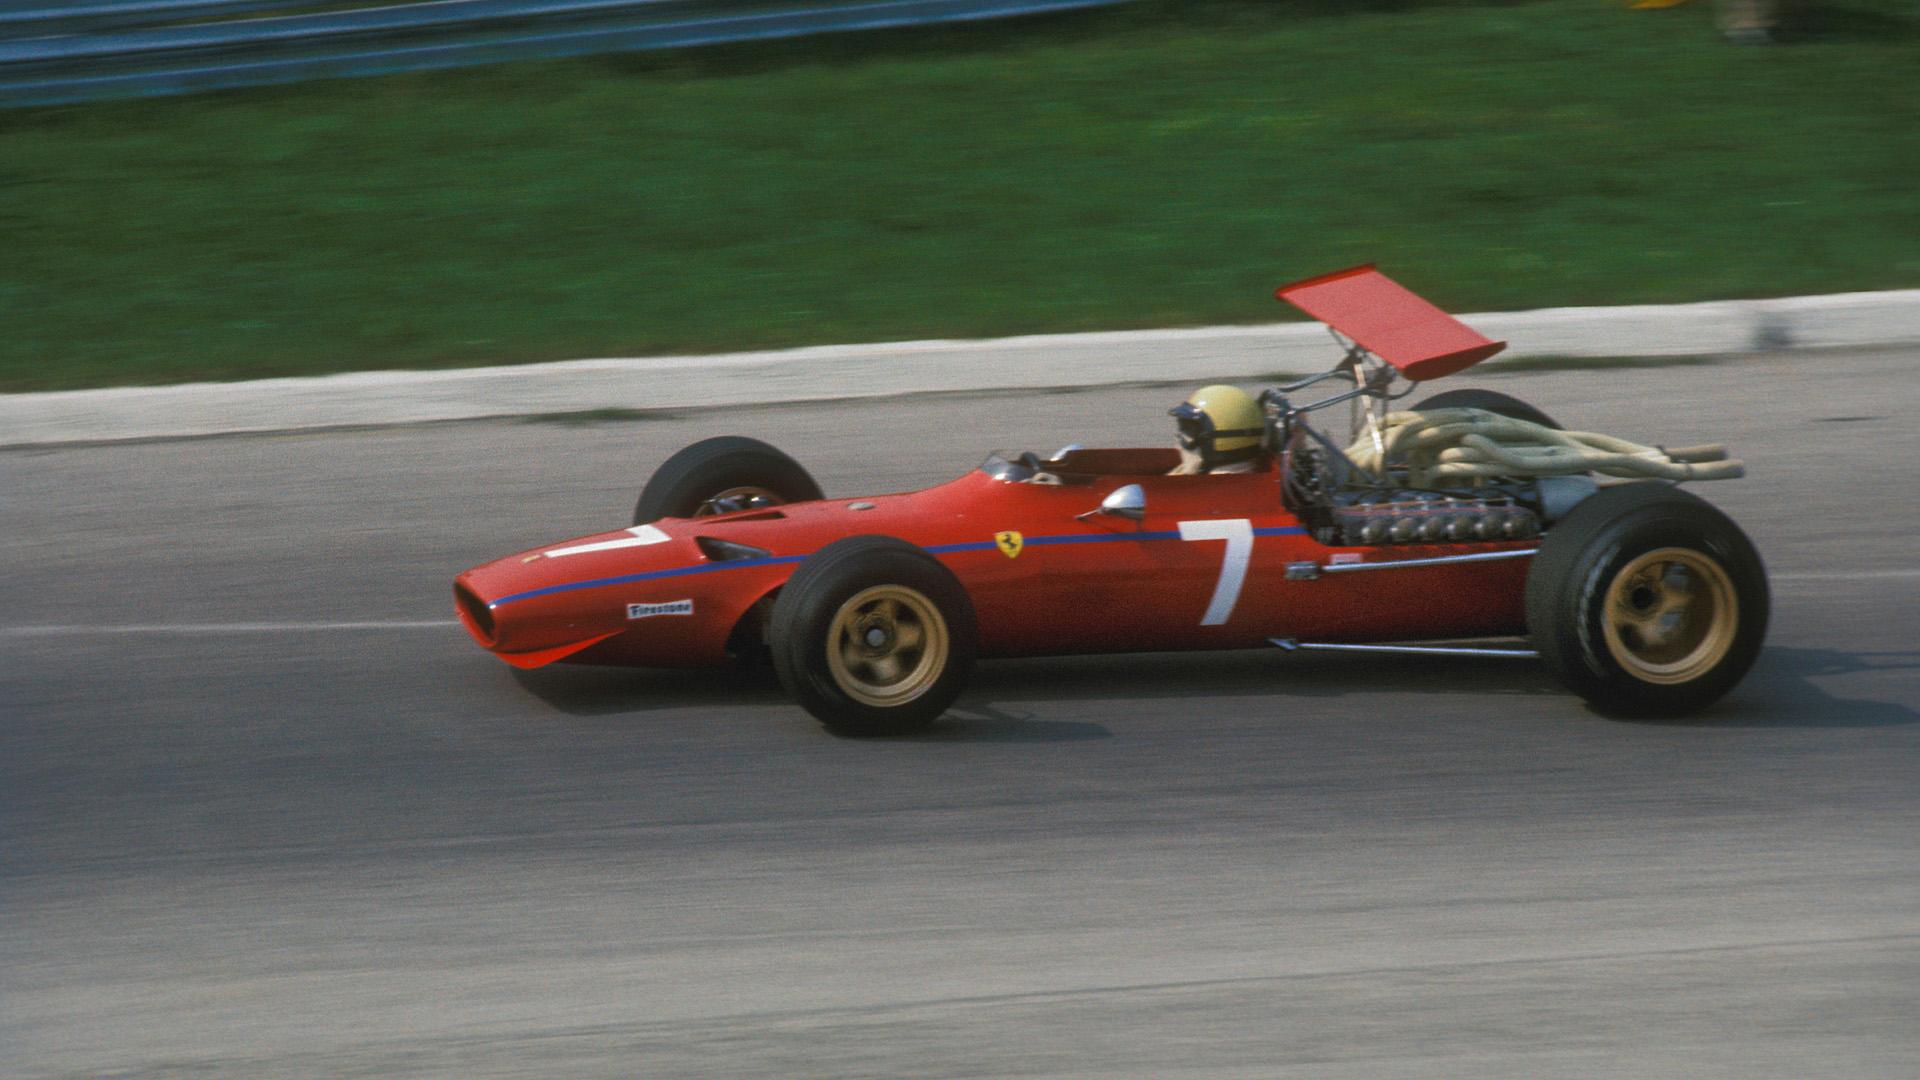 Derek Bell driving for Ferrari at the 1968 F1 italian Grand prix at Monza